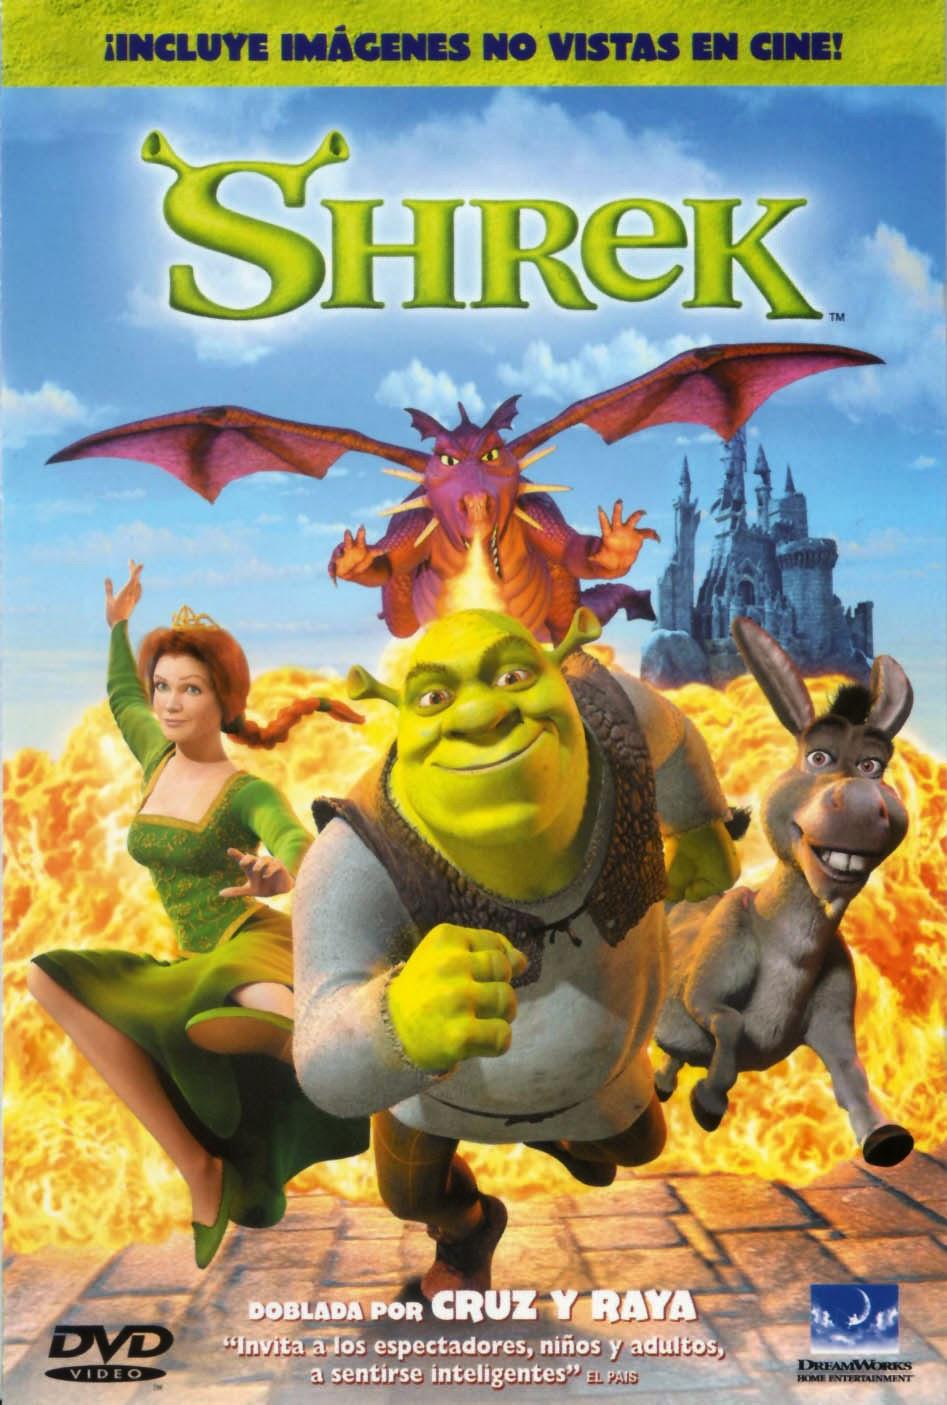 Watch Shrek (2001) Online For Free Full Movie English Stream